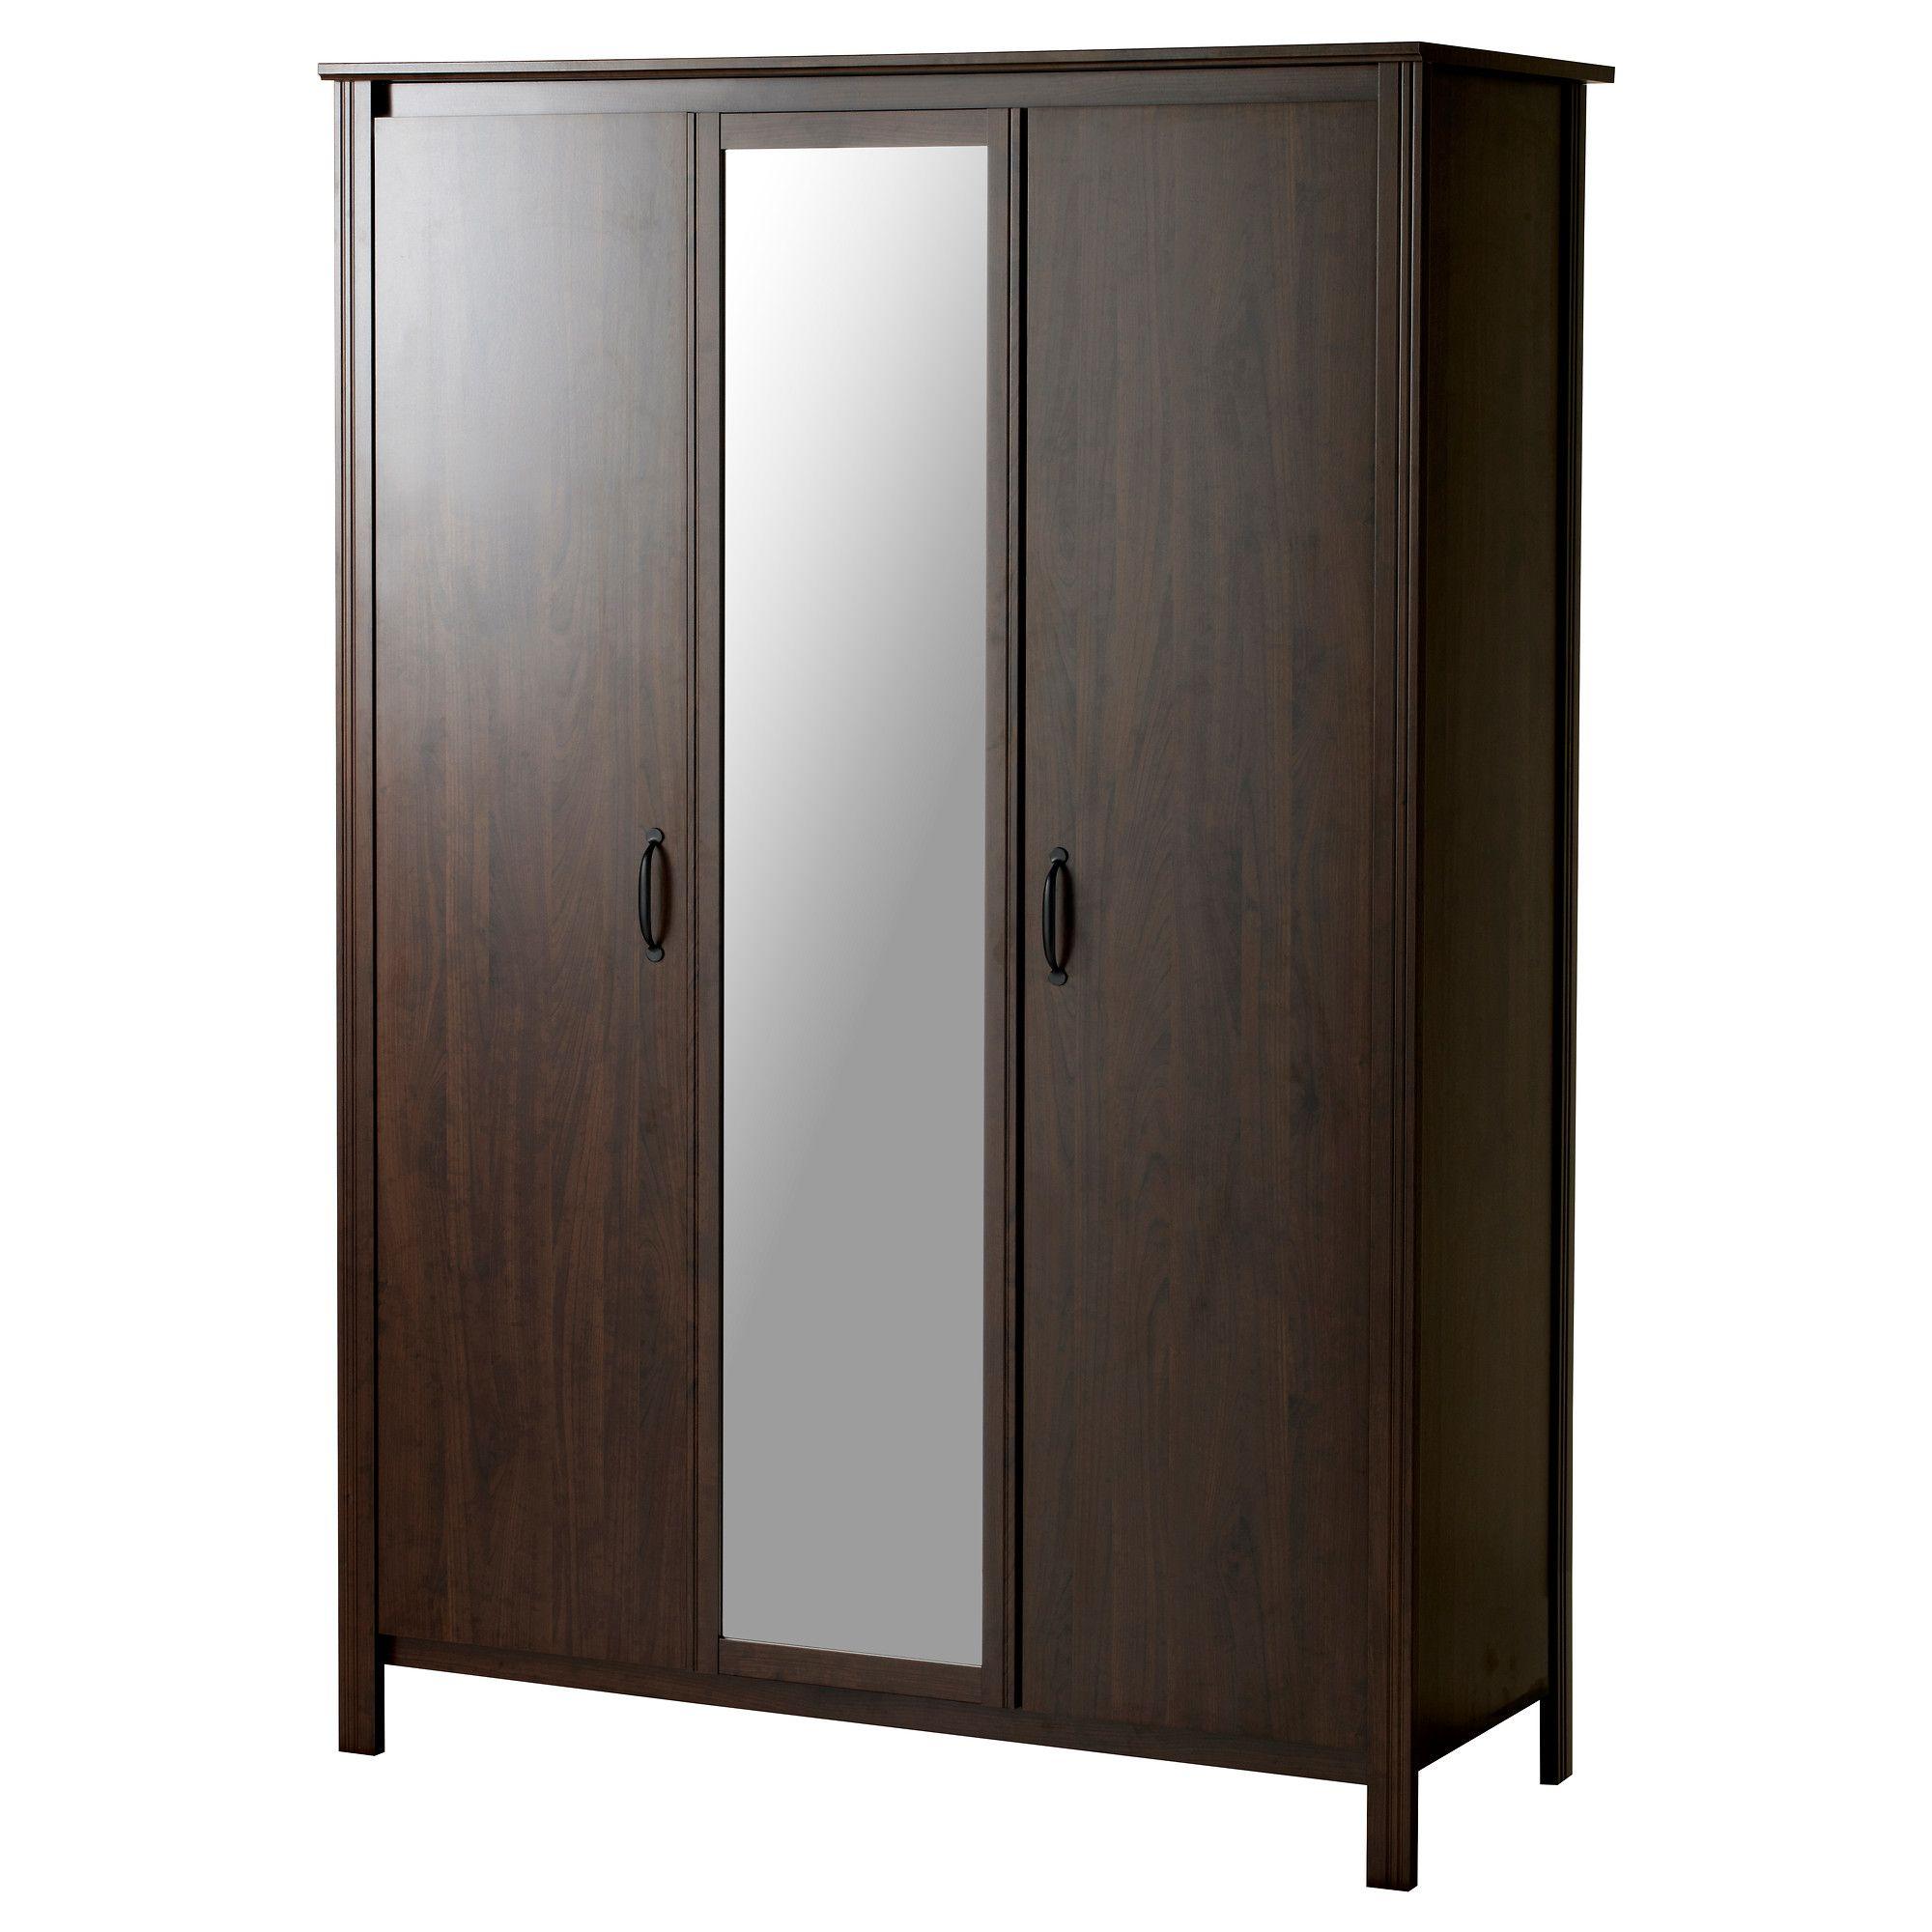 Furniture Home Furnishings Find Your Inspiration Ikea Wardrobe Ikea Brusali Ikea